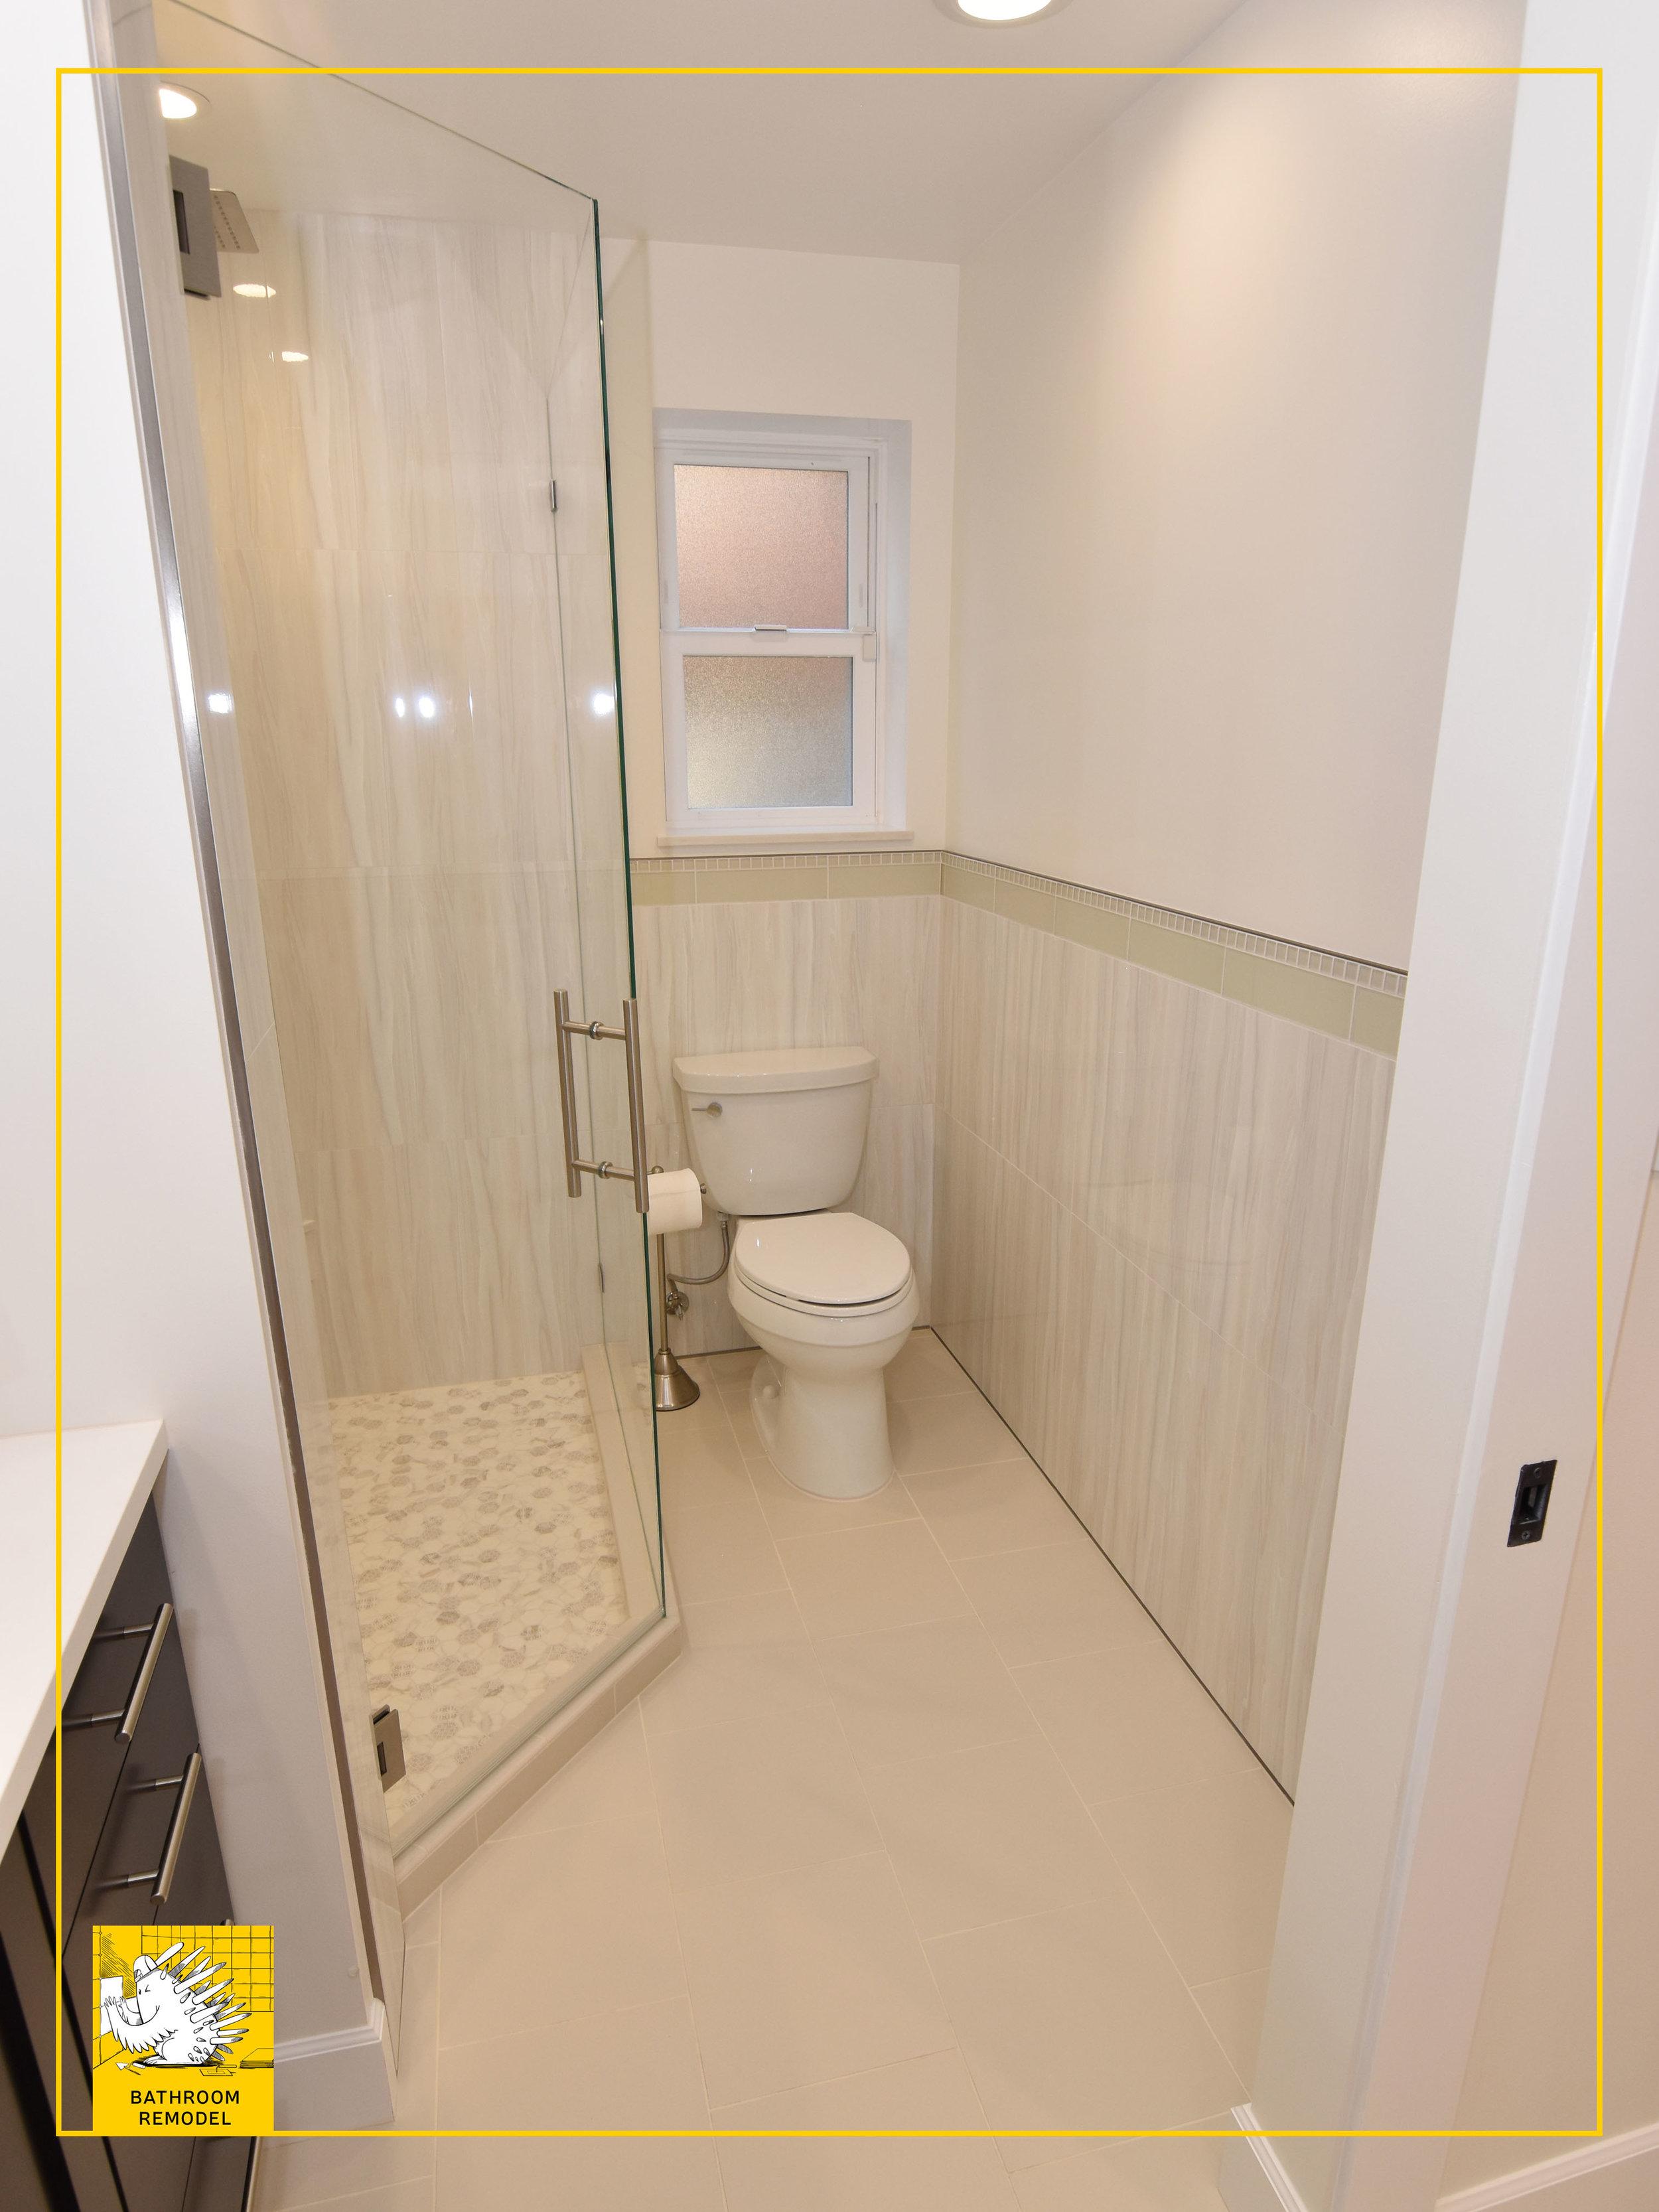 MT bathroom 6 after 4.jpg